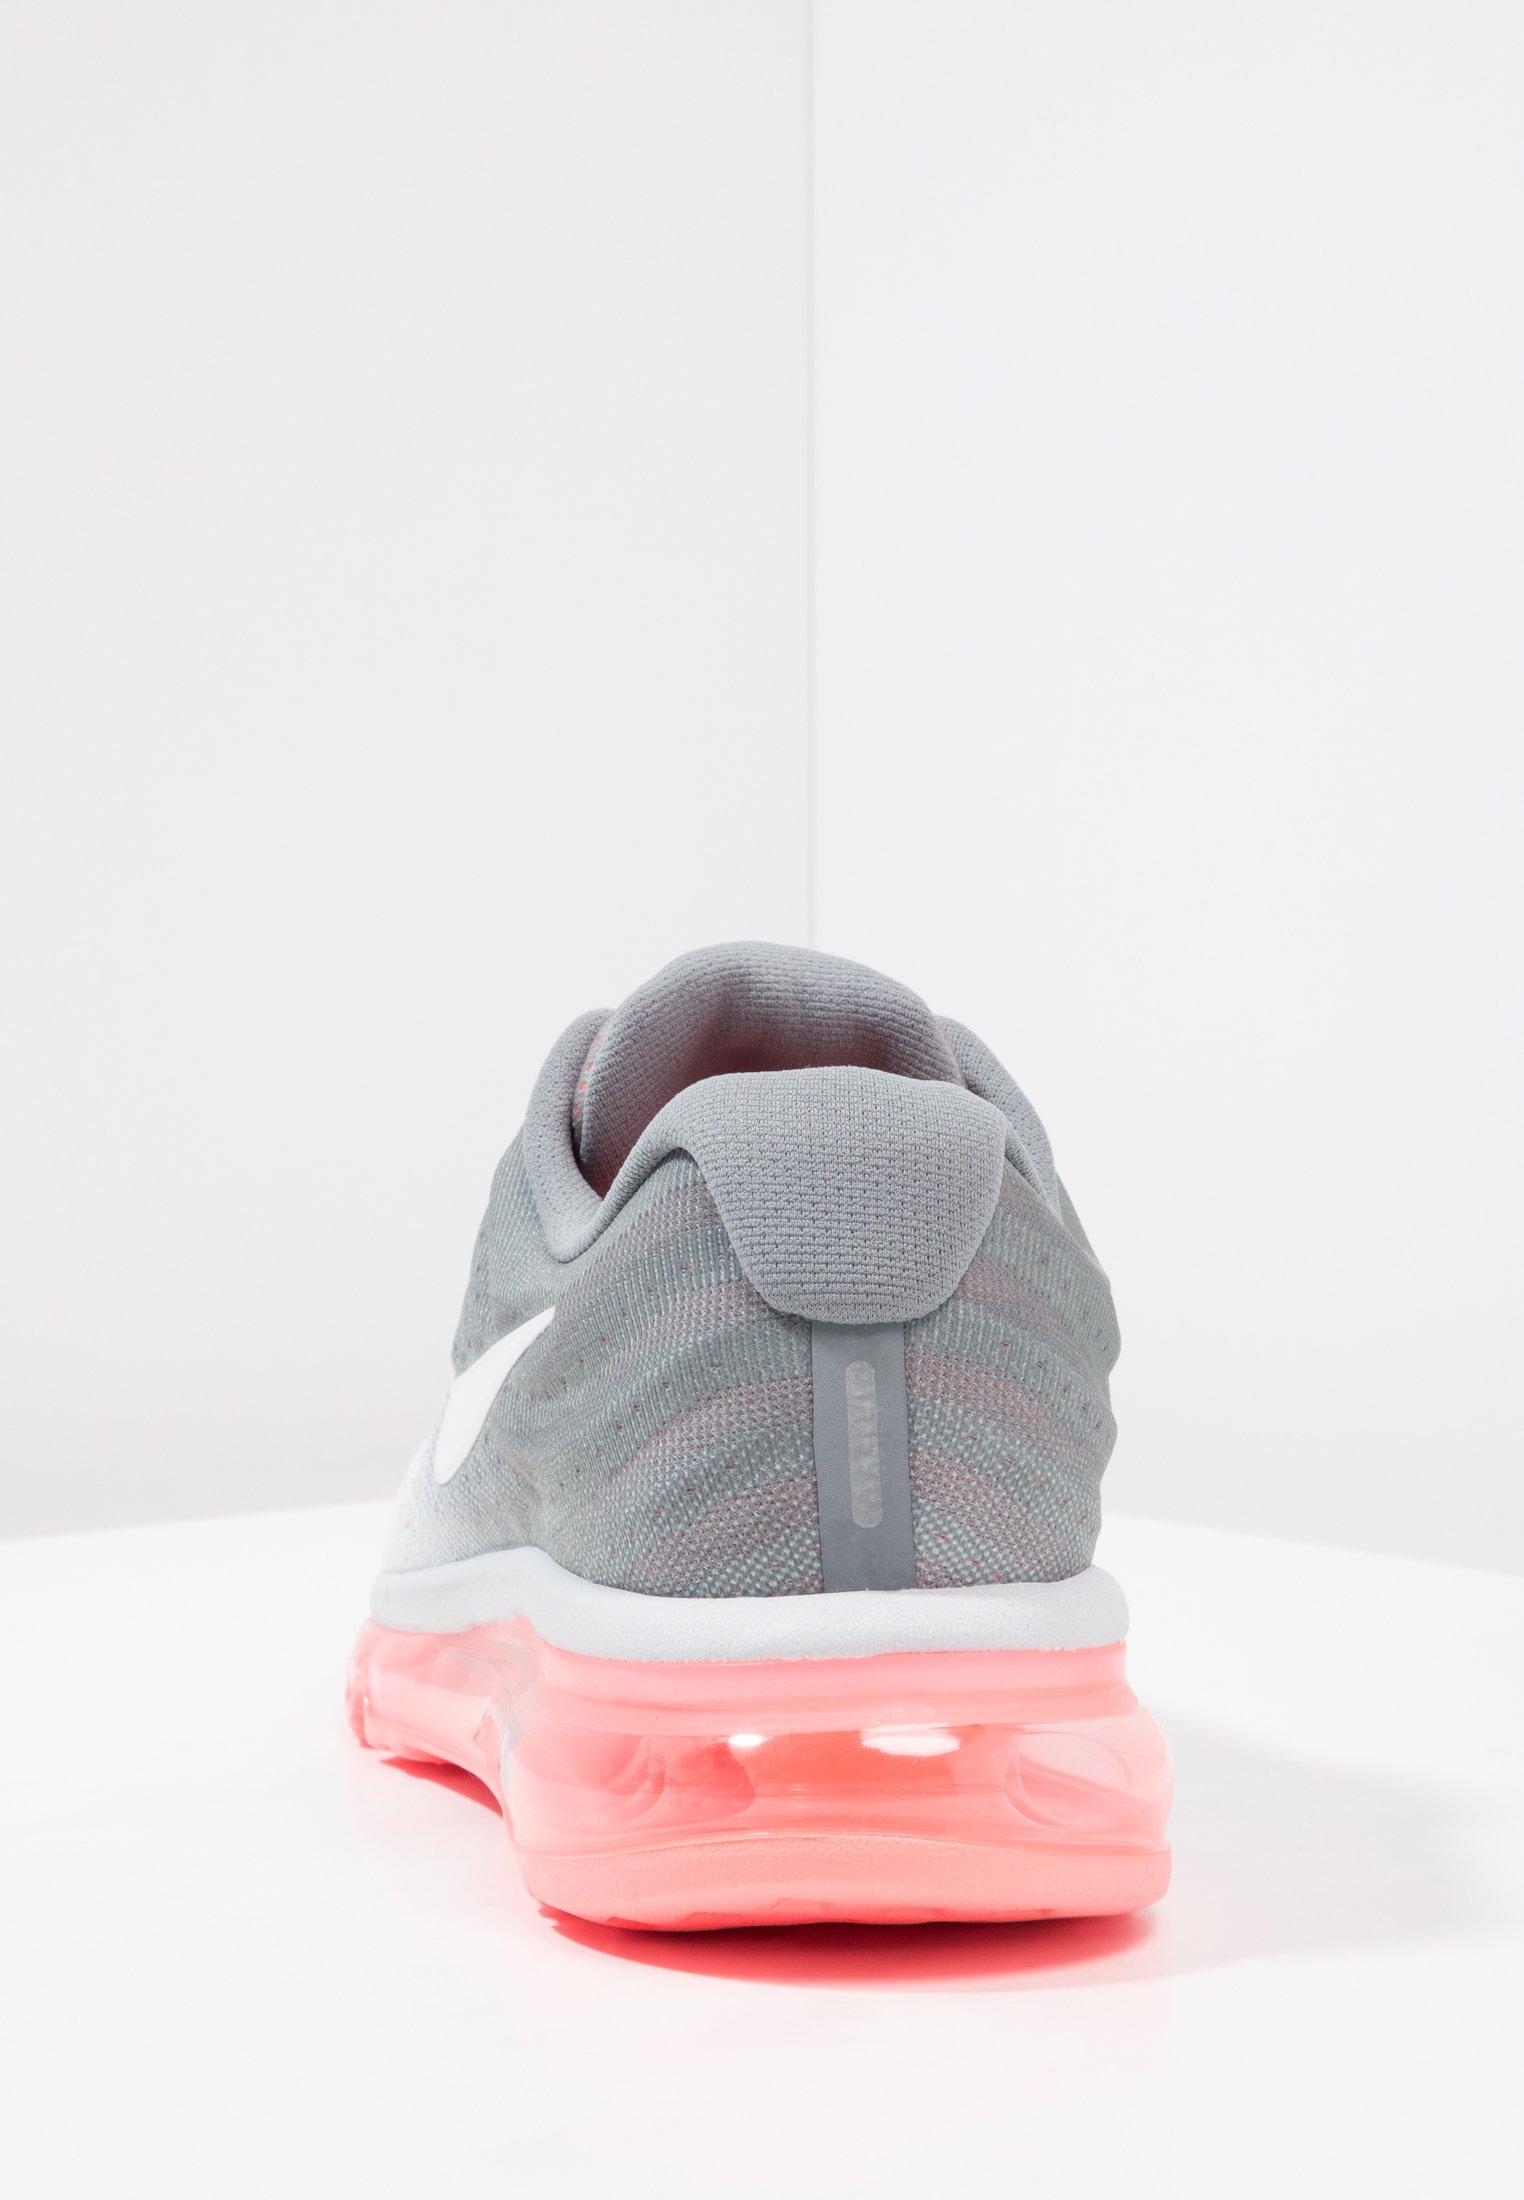 AIR MAX 2017 Chaussures de running neutres grisblanc